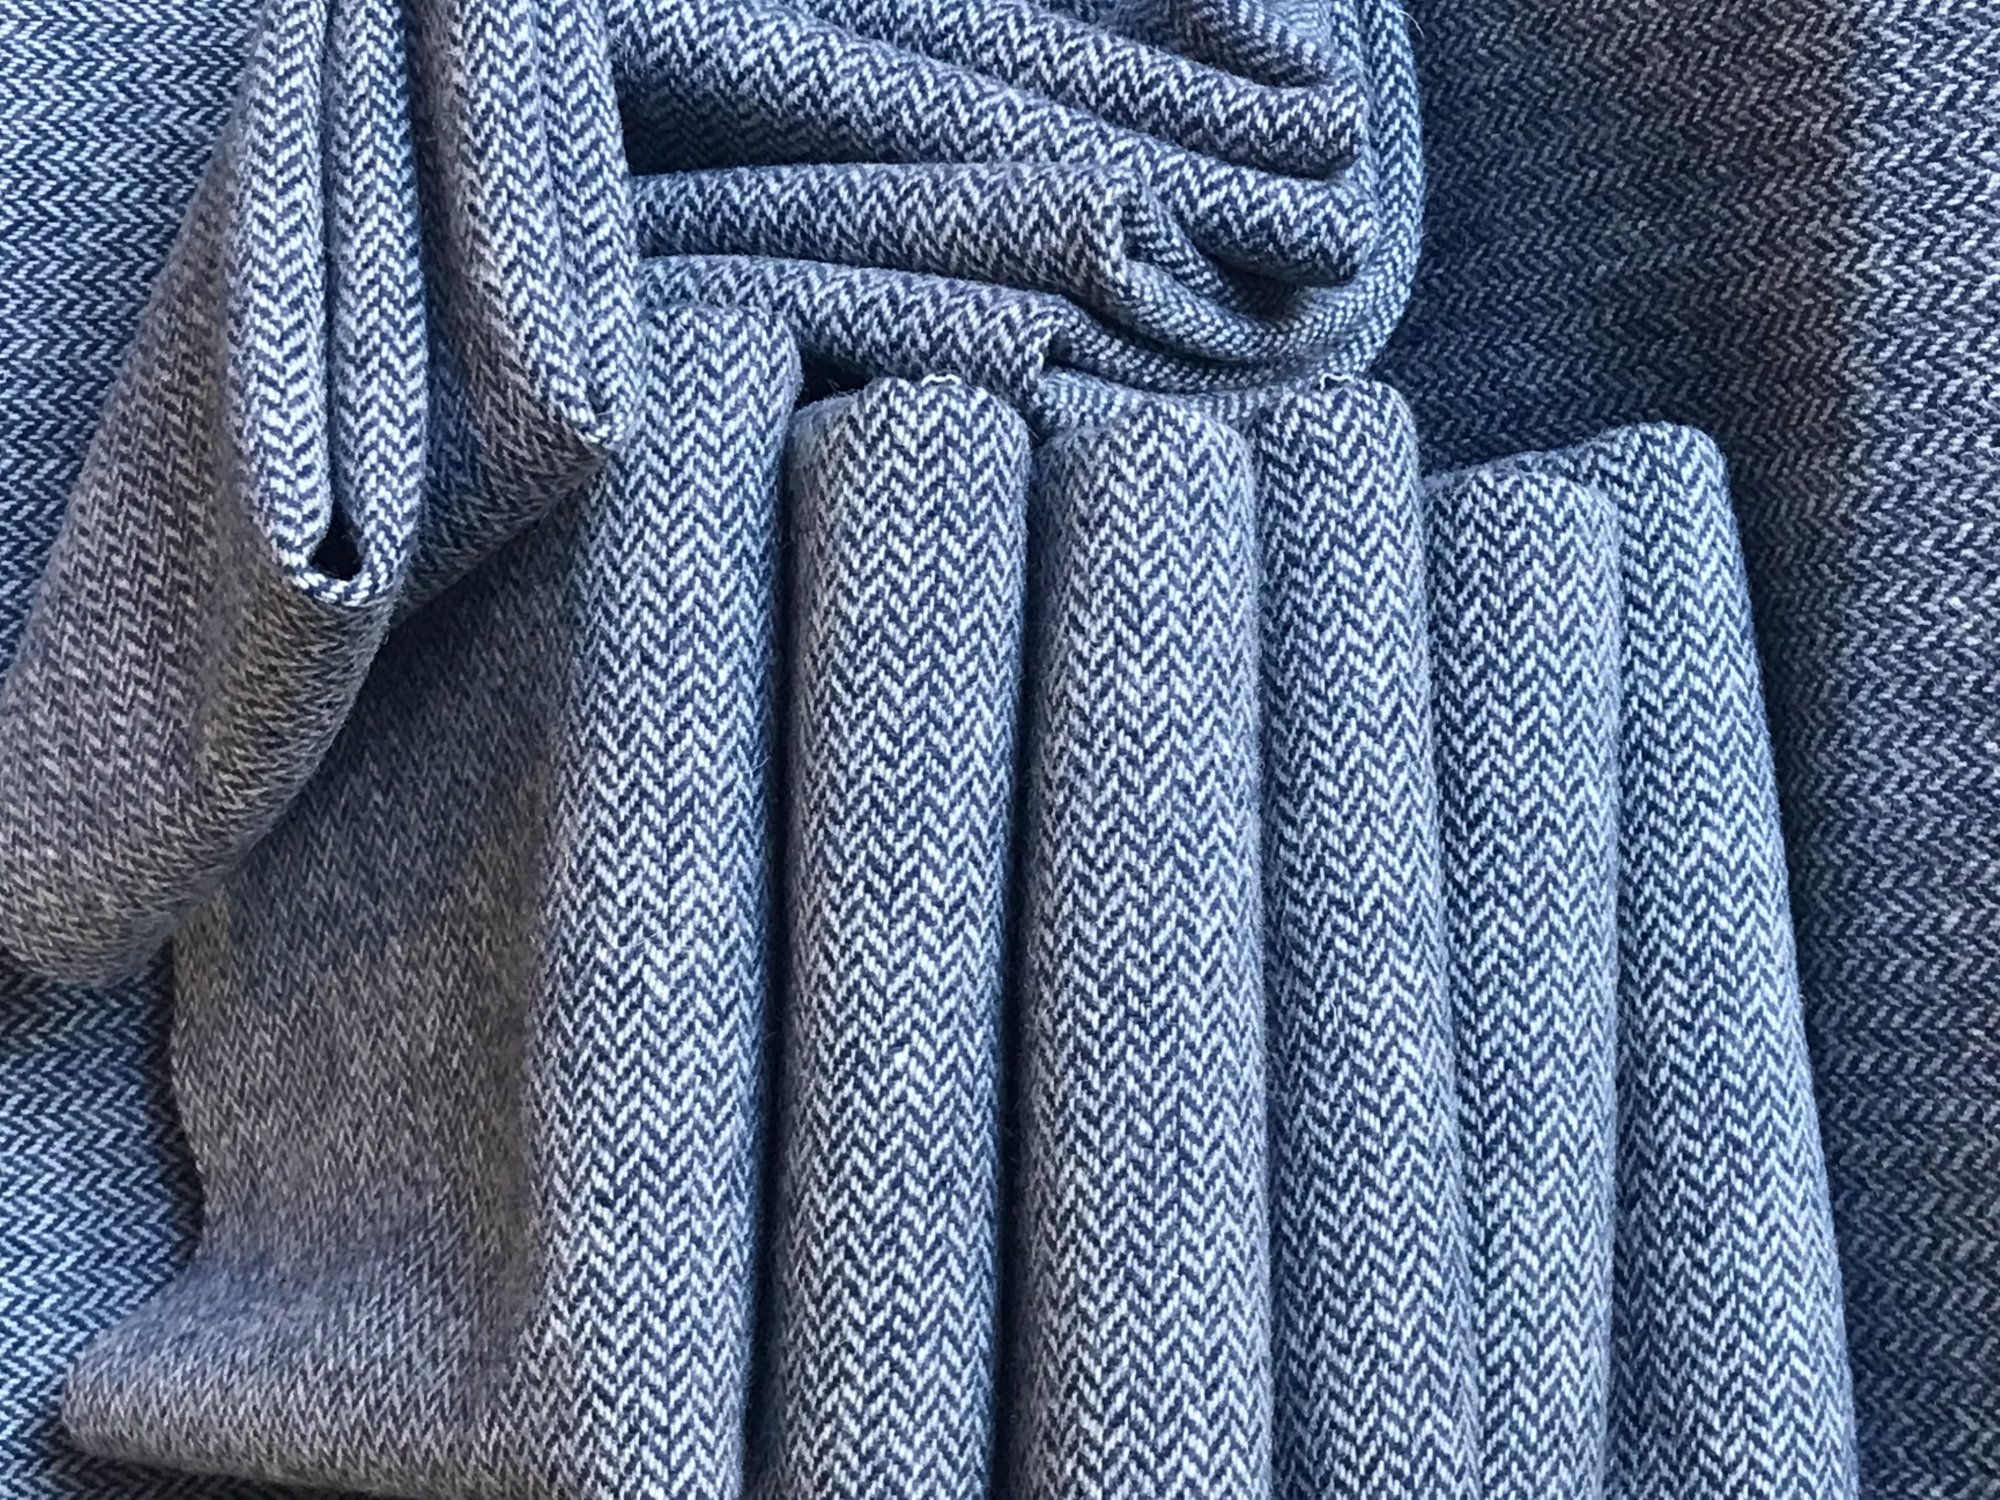 Farmer Blue 18 X 21  Wool  Navy Herringbone